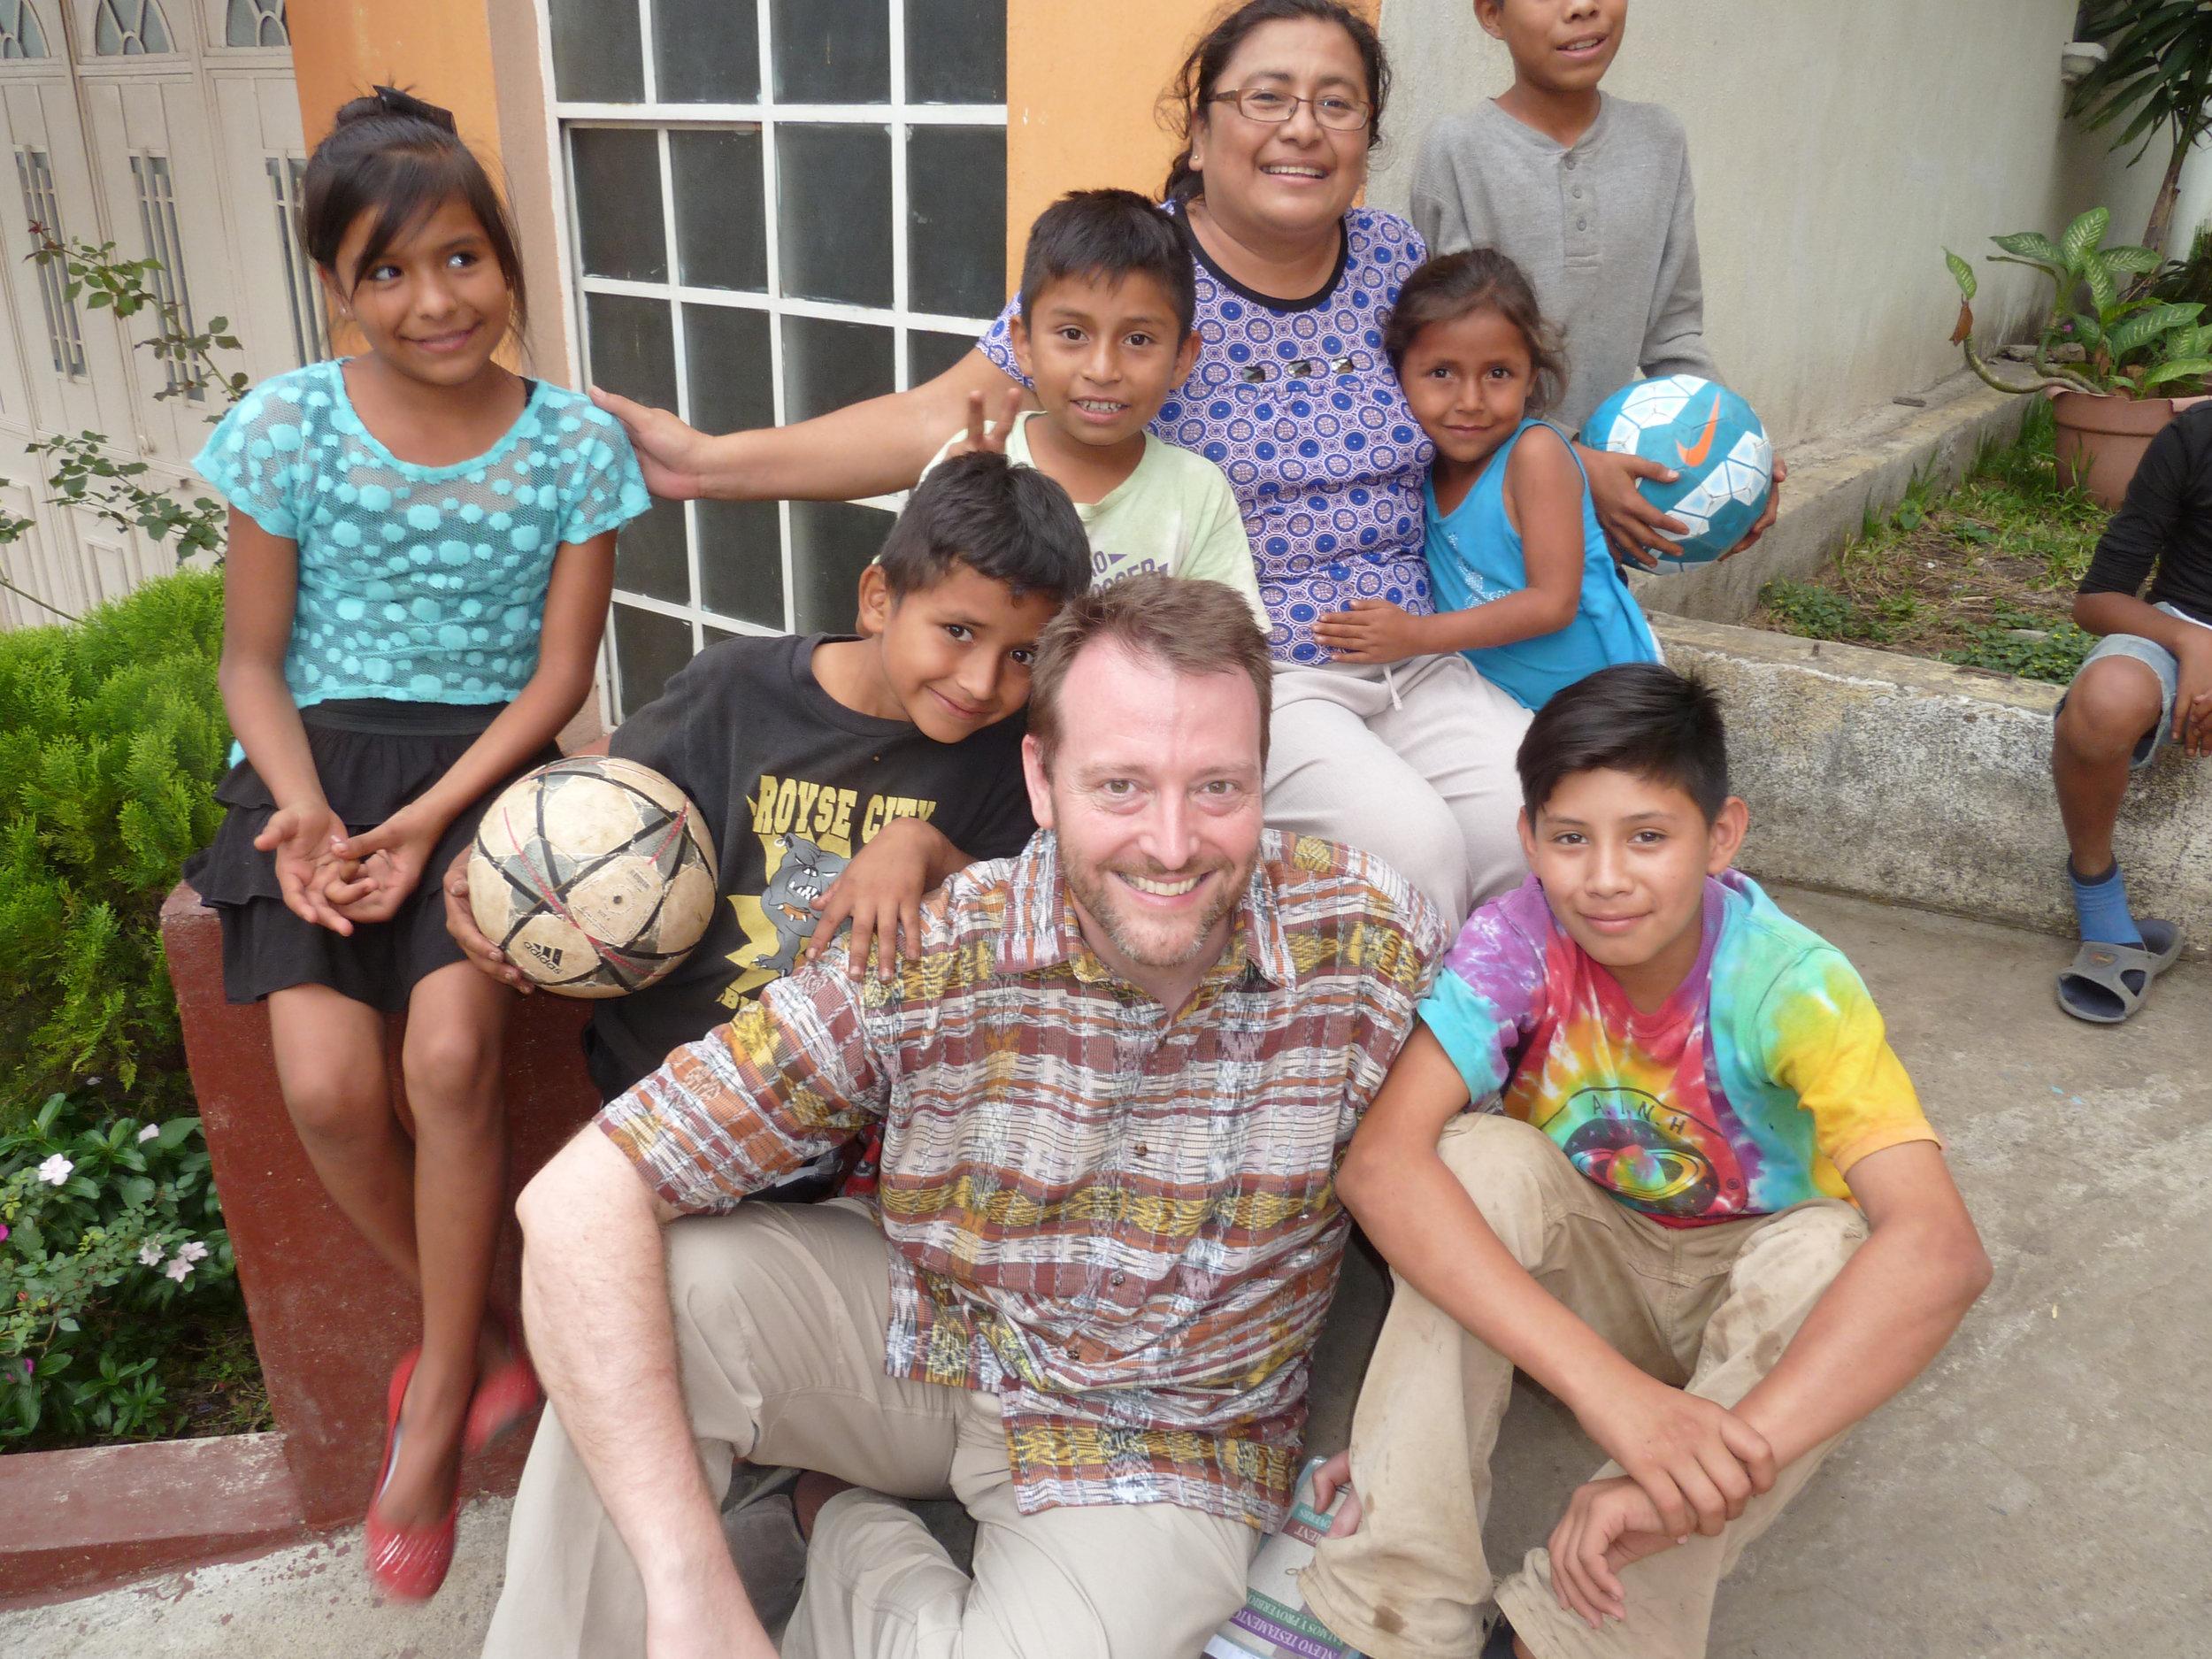 Pastor Chris Romig with children in Guatemala